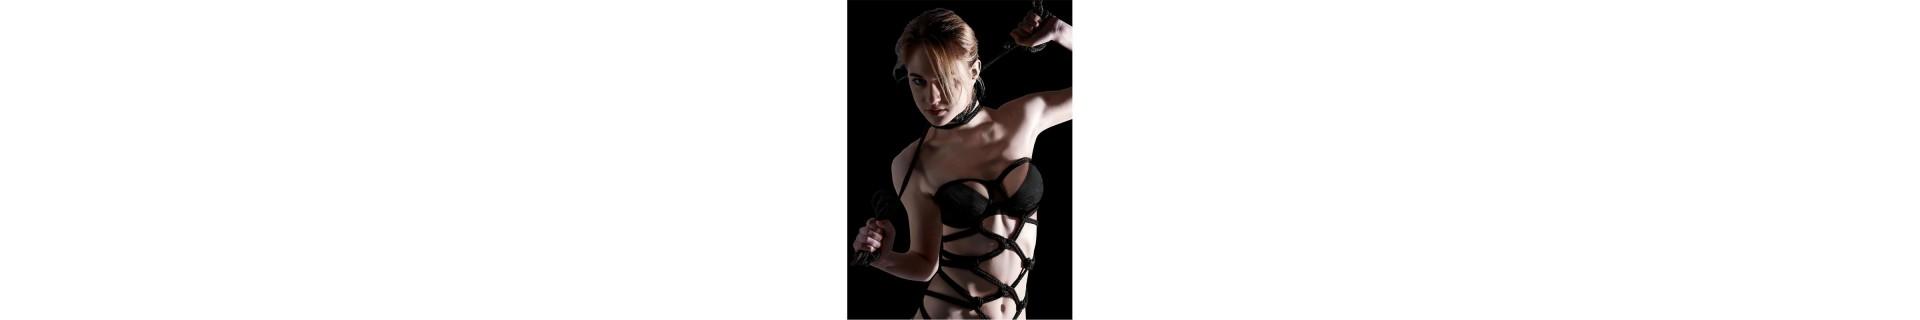 Comprar ataduras bondage【Envío discreto】 ❤️